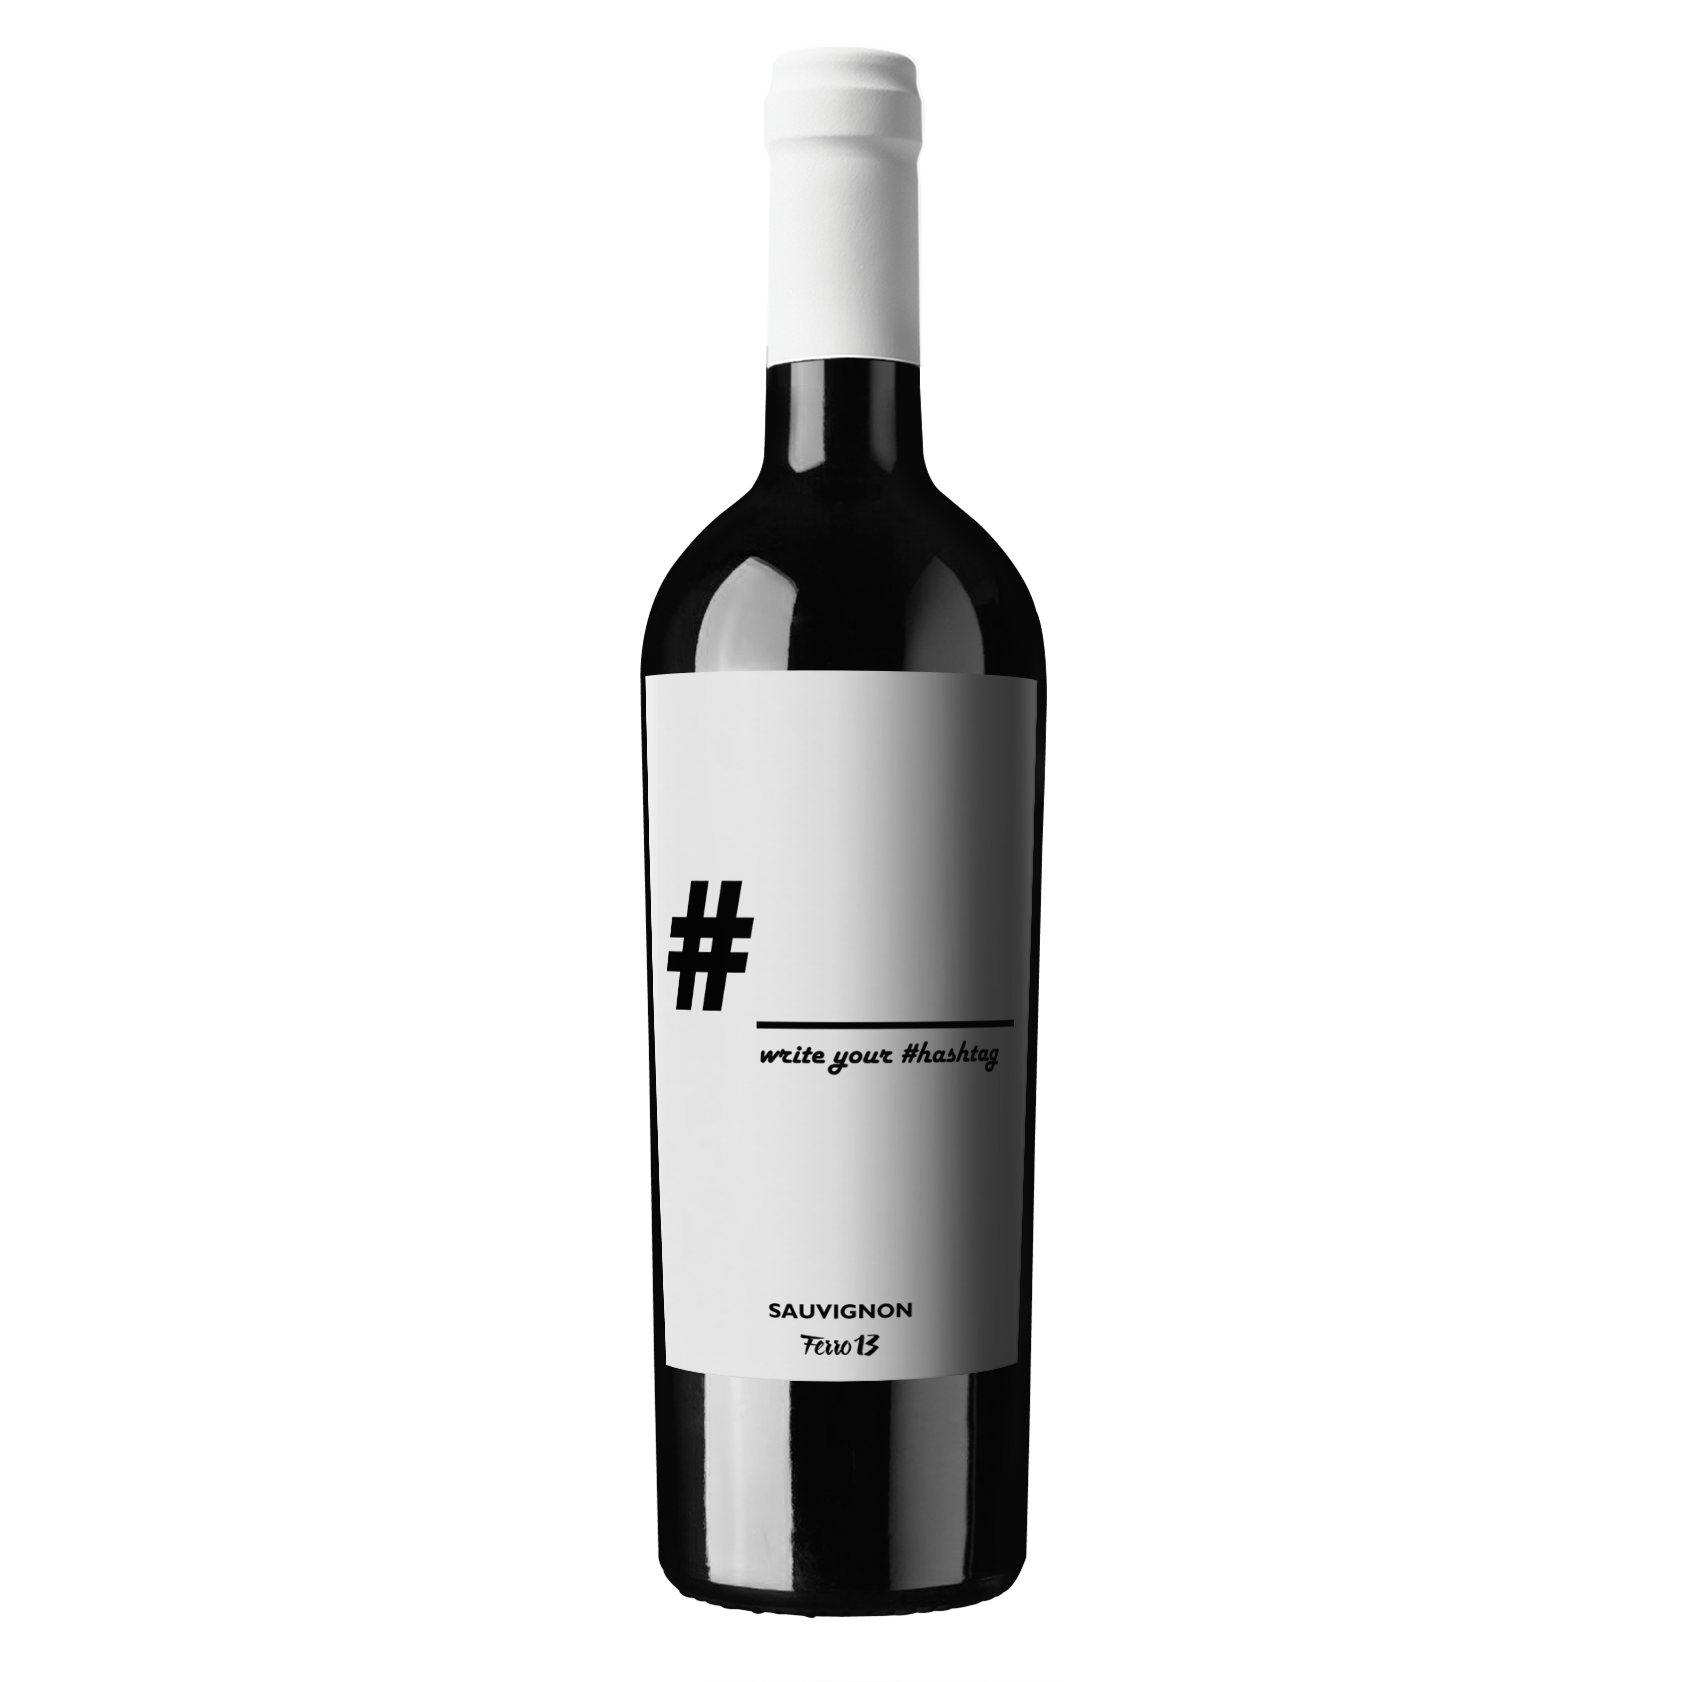 Vino Hashtag Sauvignon CL.75